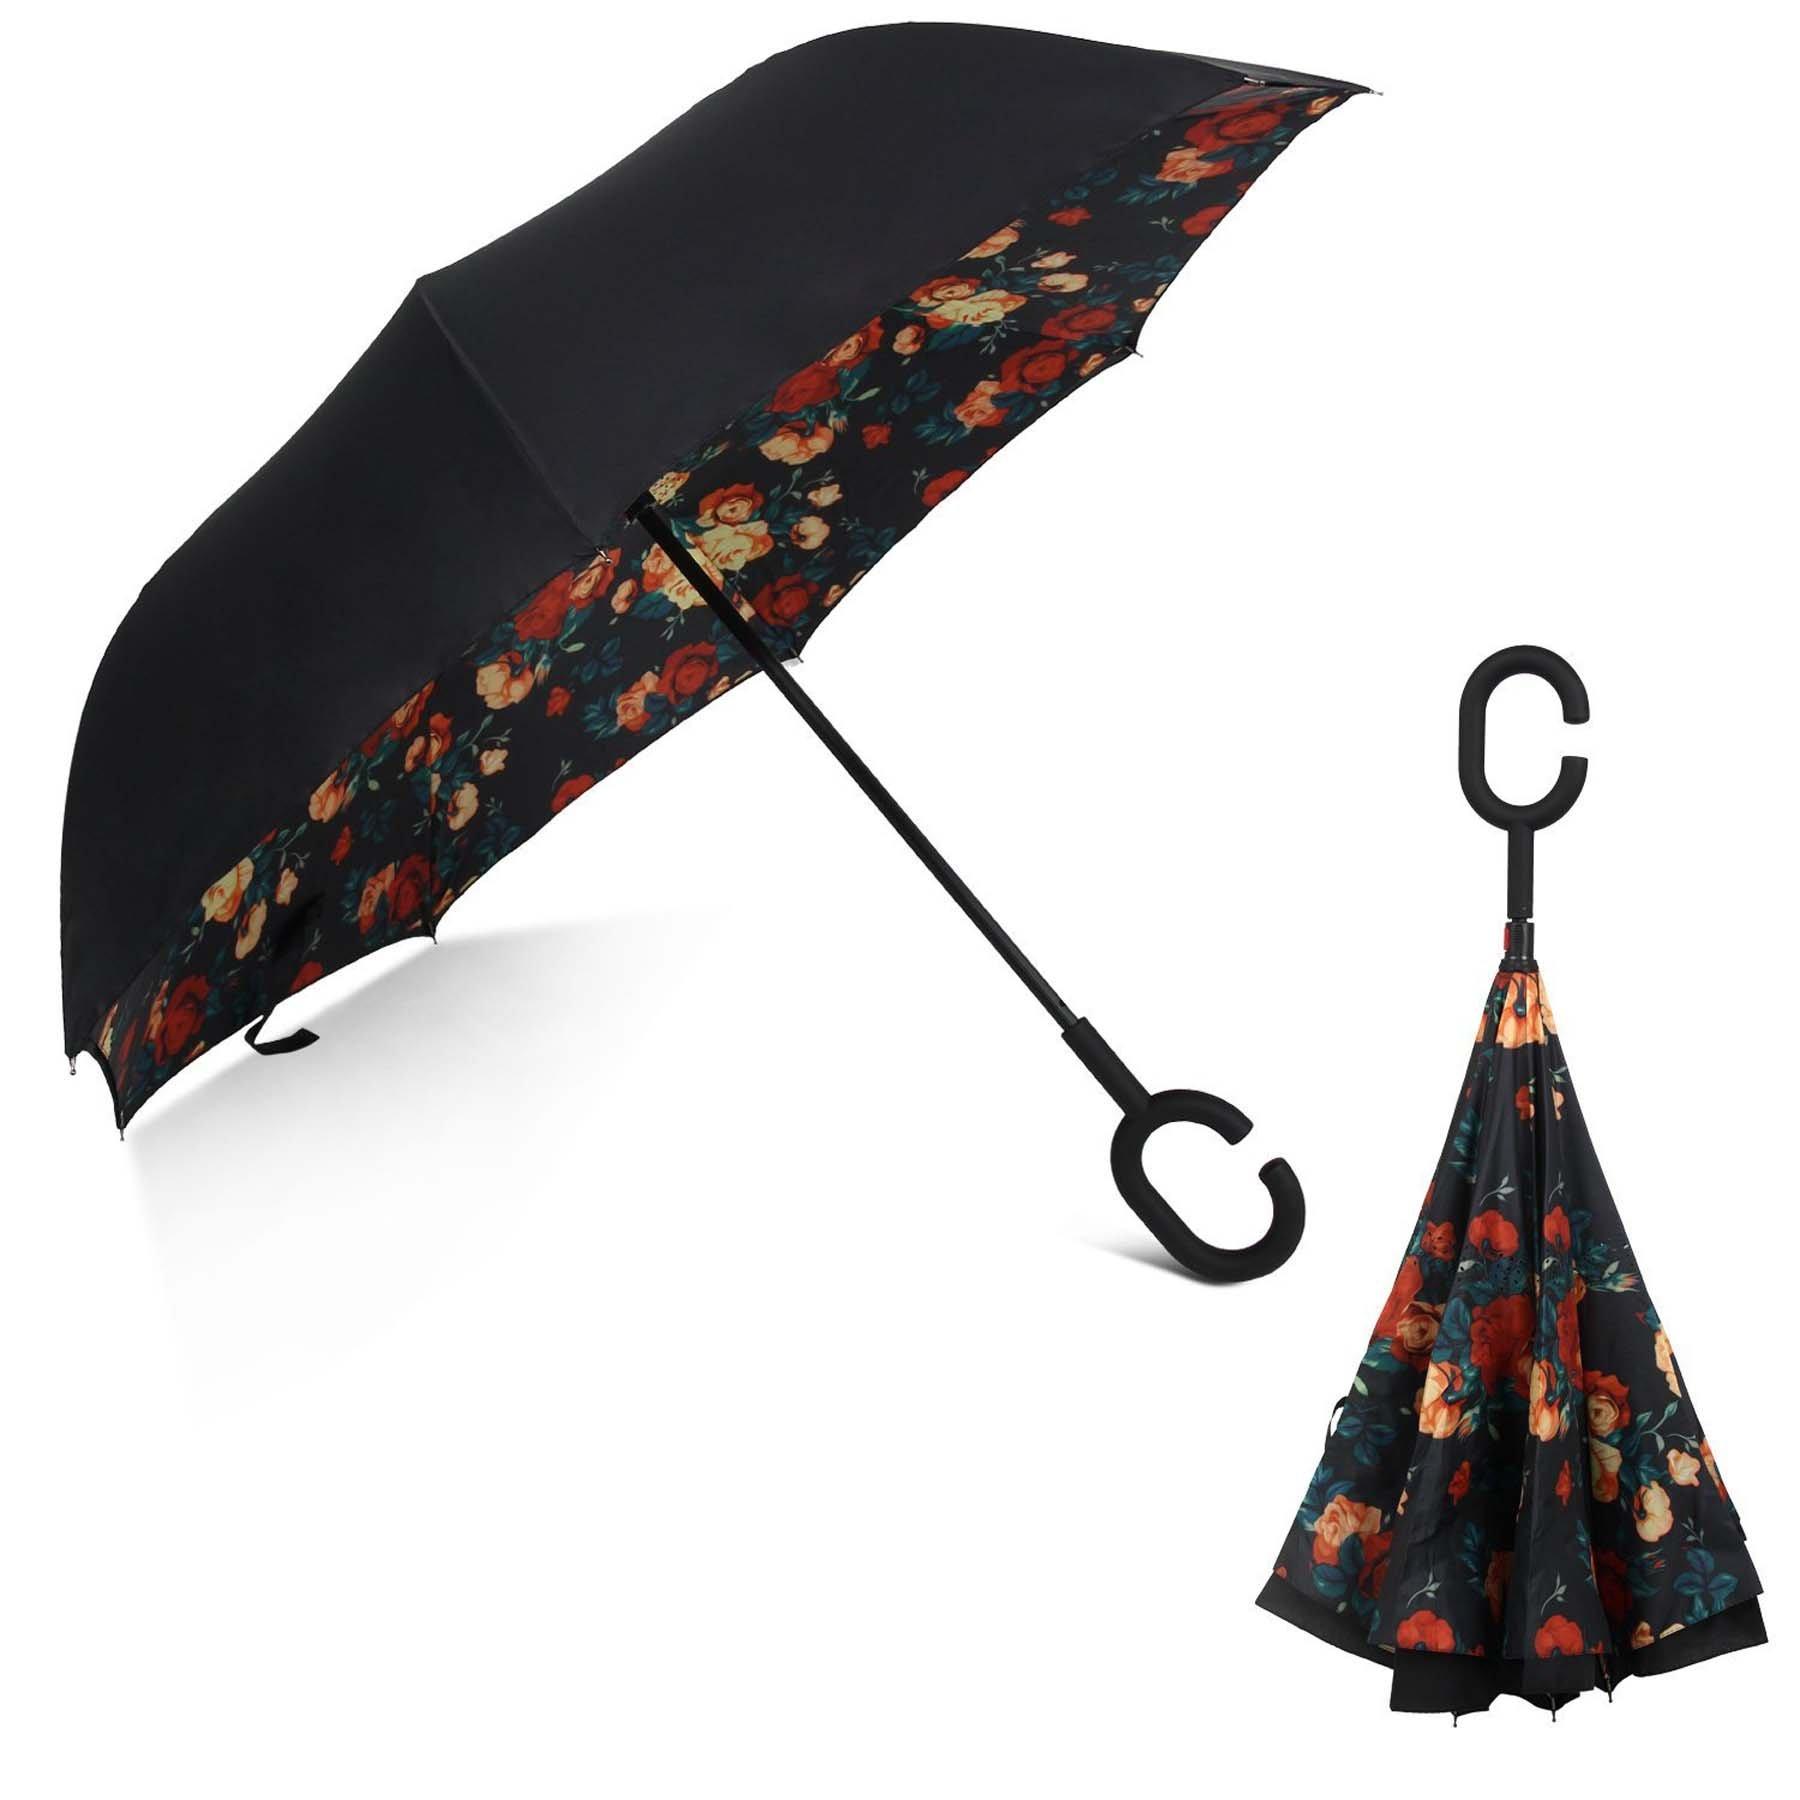 3ac4c7395747 Cheap Double Layer Black Umbrellas, find Double Layer Black ...